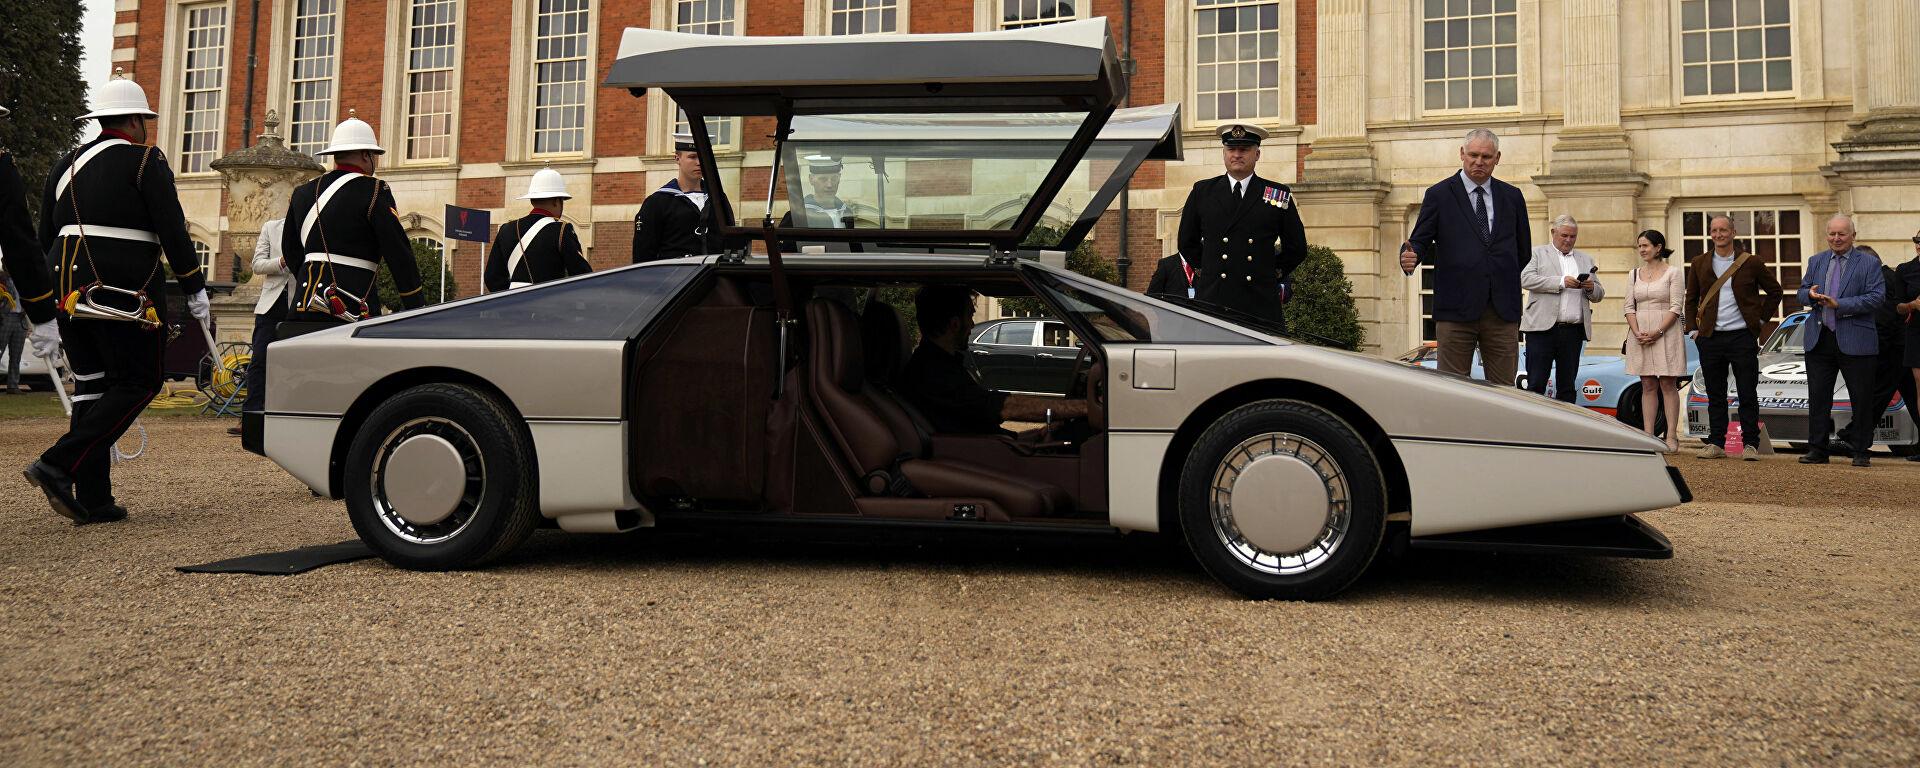 1979 Aston Martin Bulldog Concept presented in the UK - Sputnik Mondo, 1920, 09/11/2021